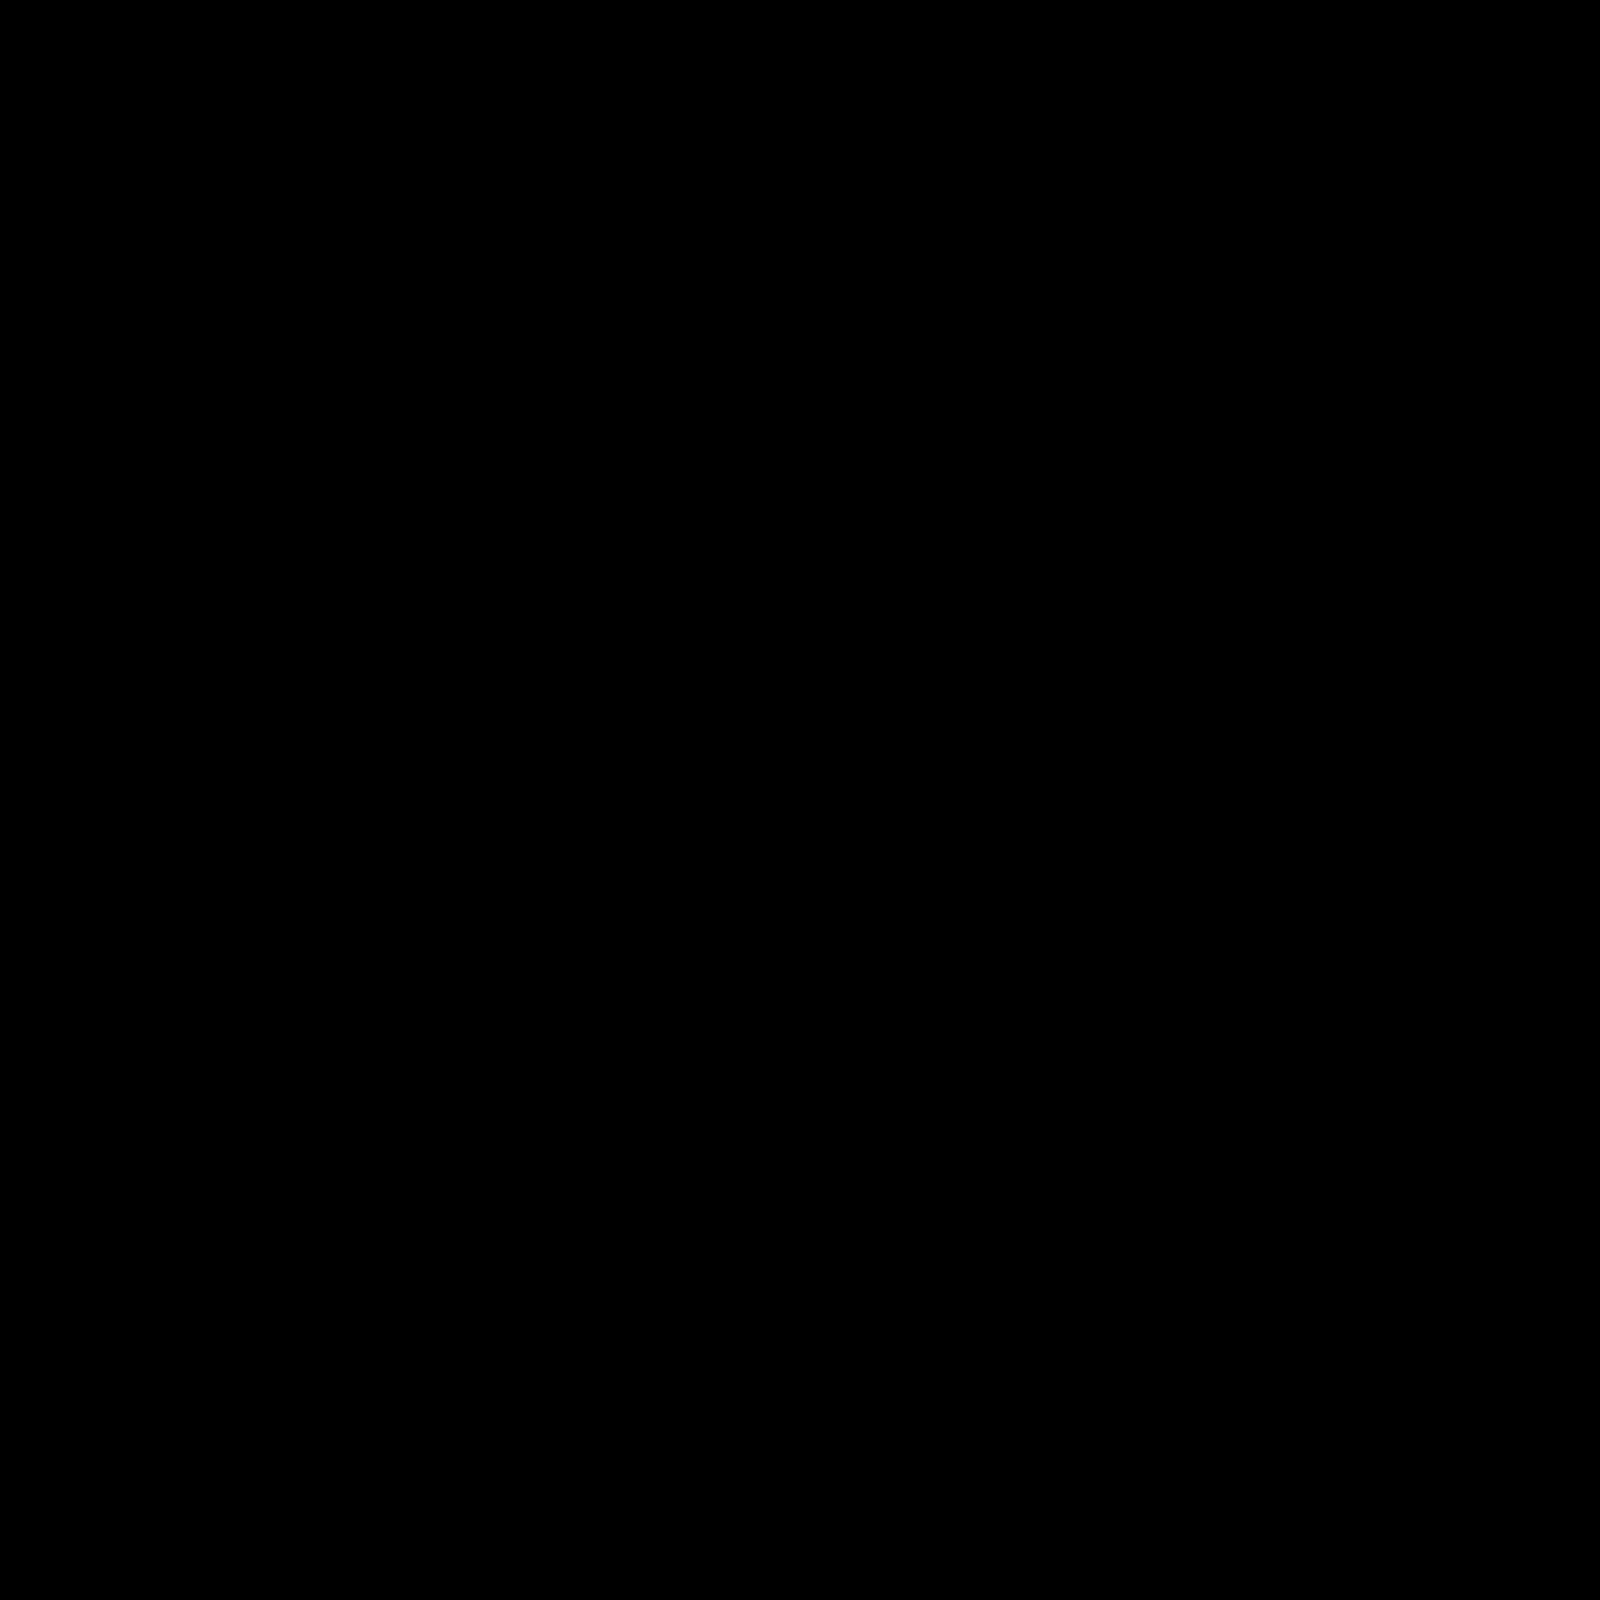 C Letter icon